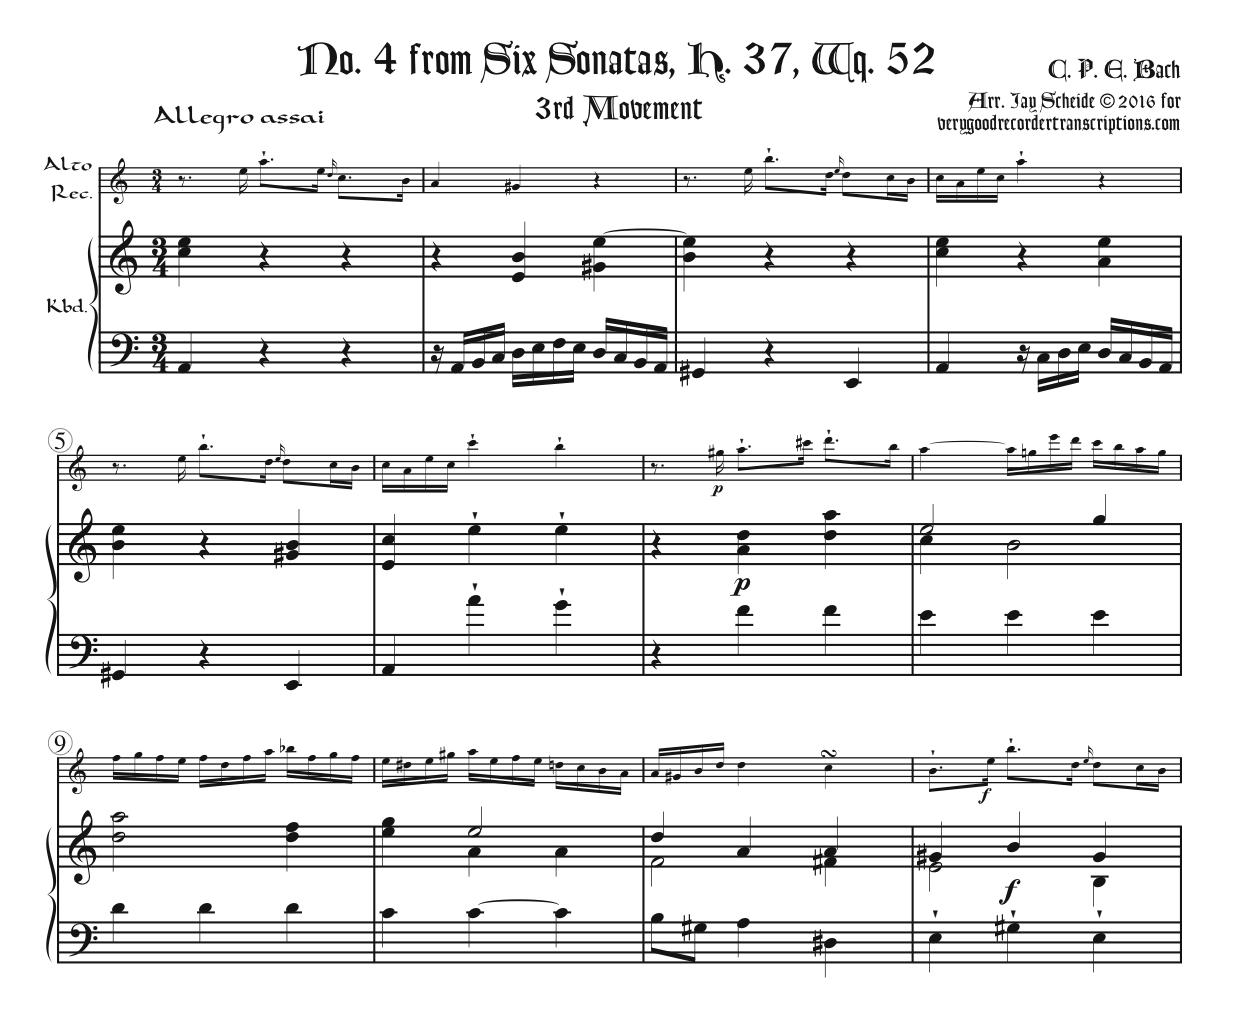 Sonata, H. 37, Wq. 52, No. 4, 3rd Mvt.